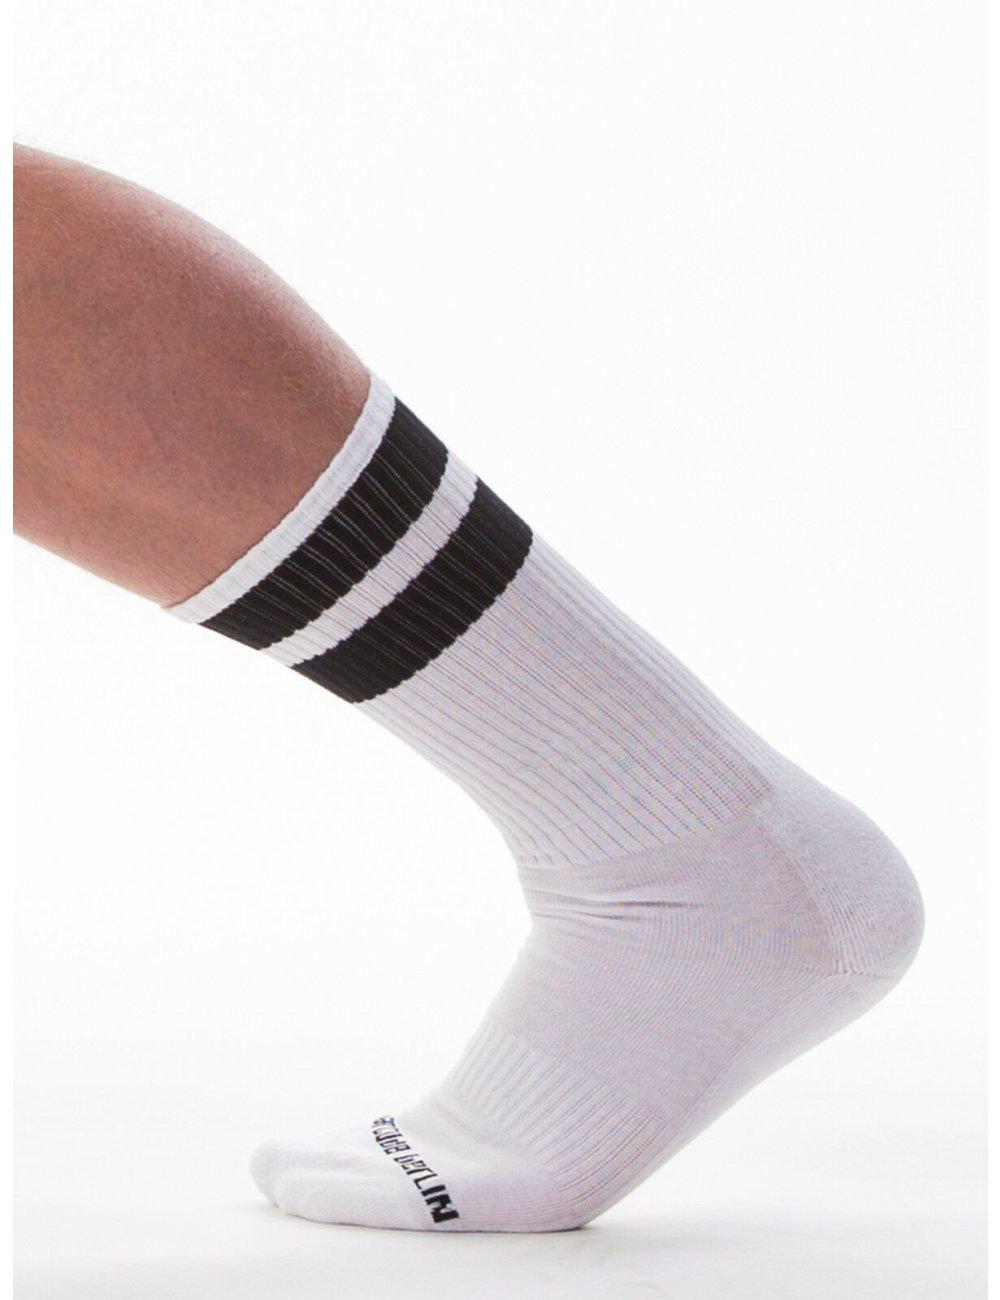 barcode Berlin Gym Socks weiß/schwarz